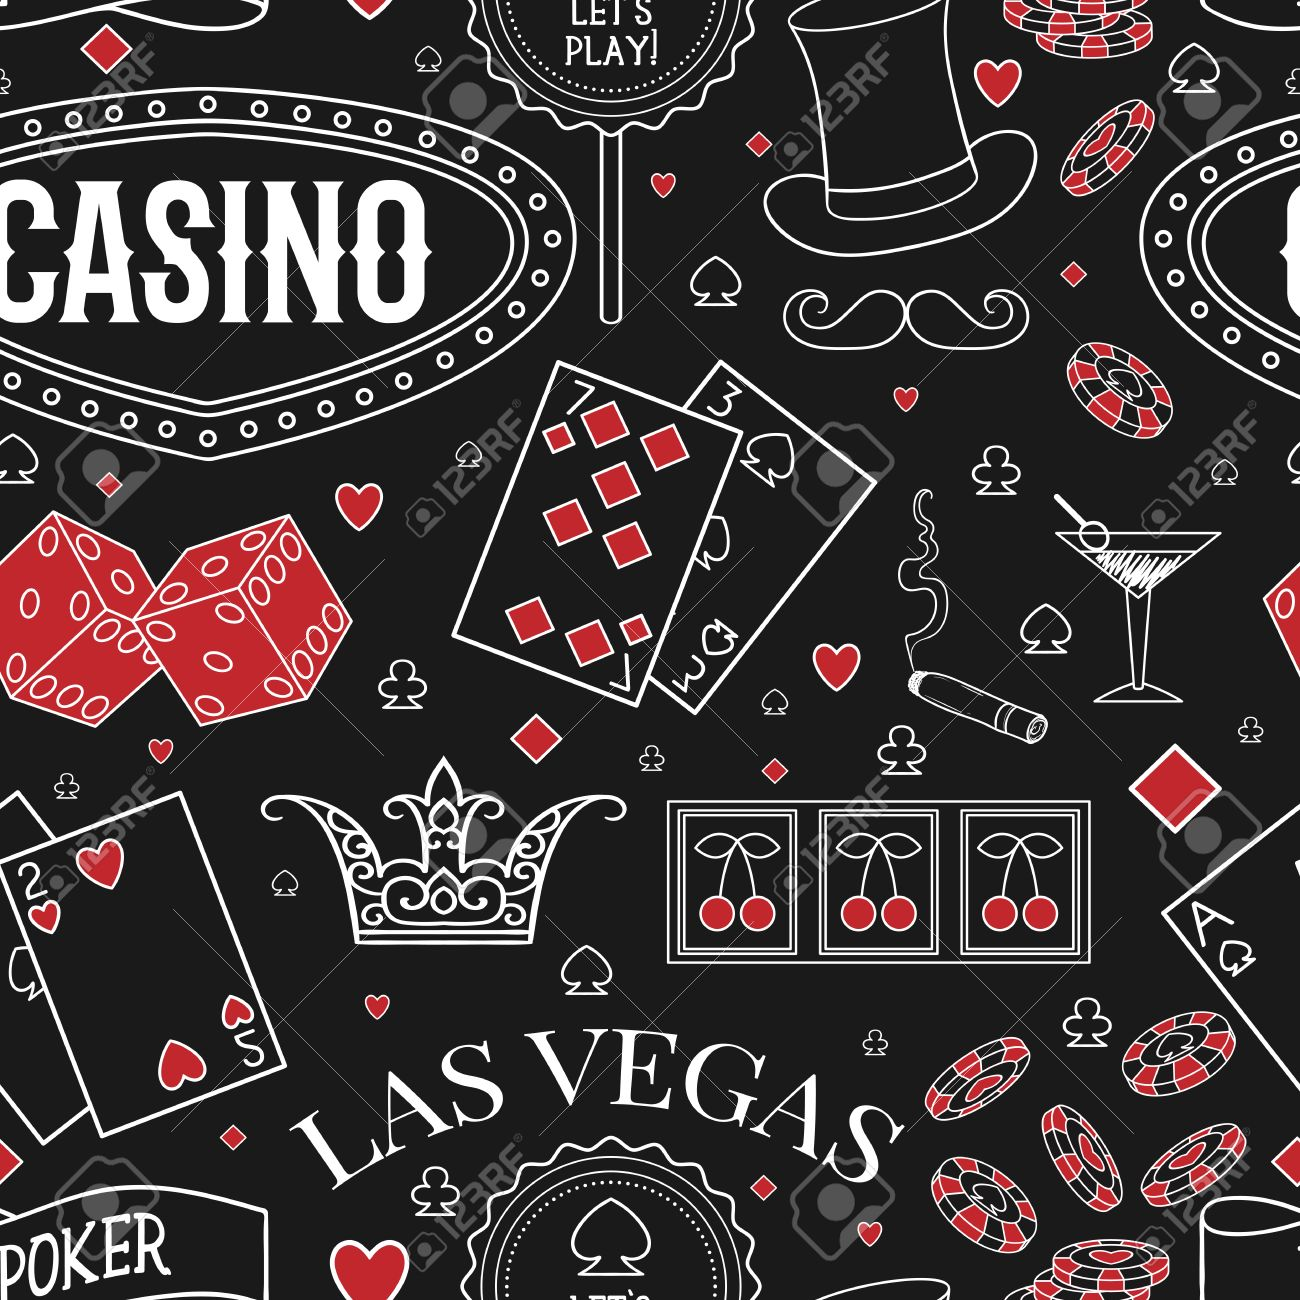 Casino theme. Seamless pattern with decorative elements on chalkboard. Gambling symbols. Vintage vector illustration - 83151937